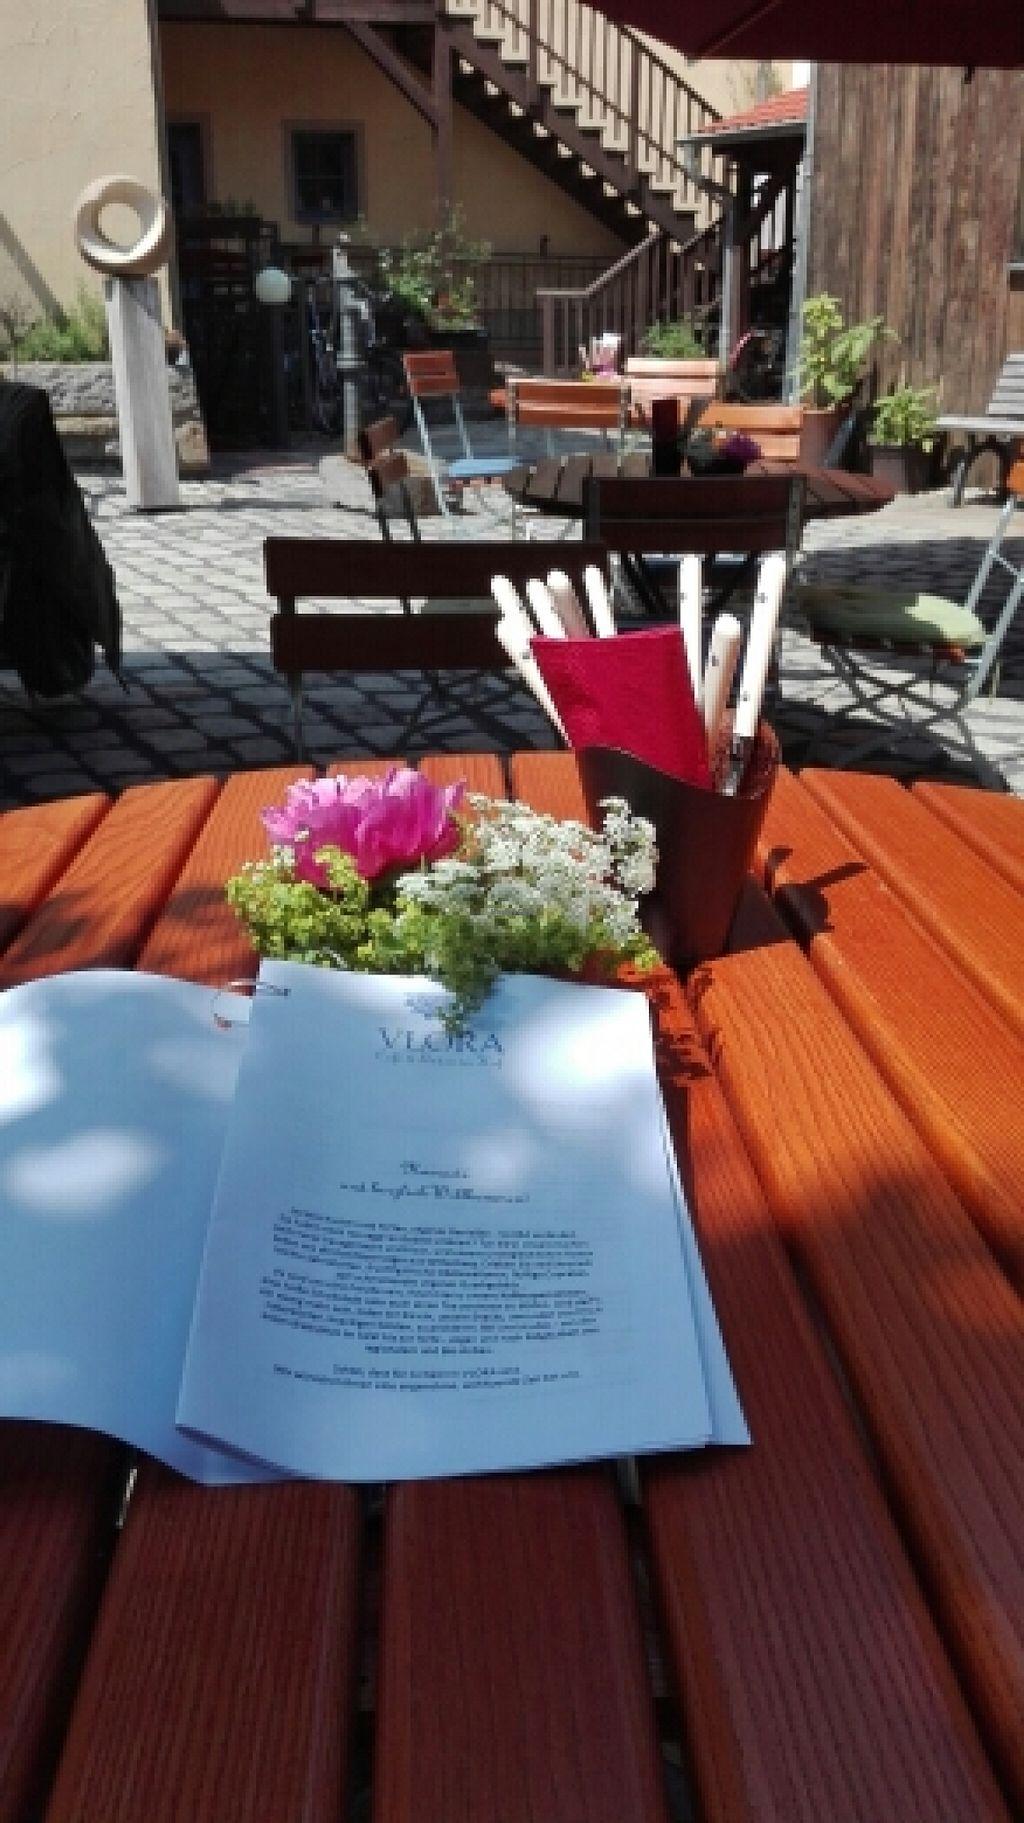 Vlora Cafe Laden Im Hof Lutherstadt Wittenberg Restaurant Happycow